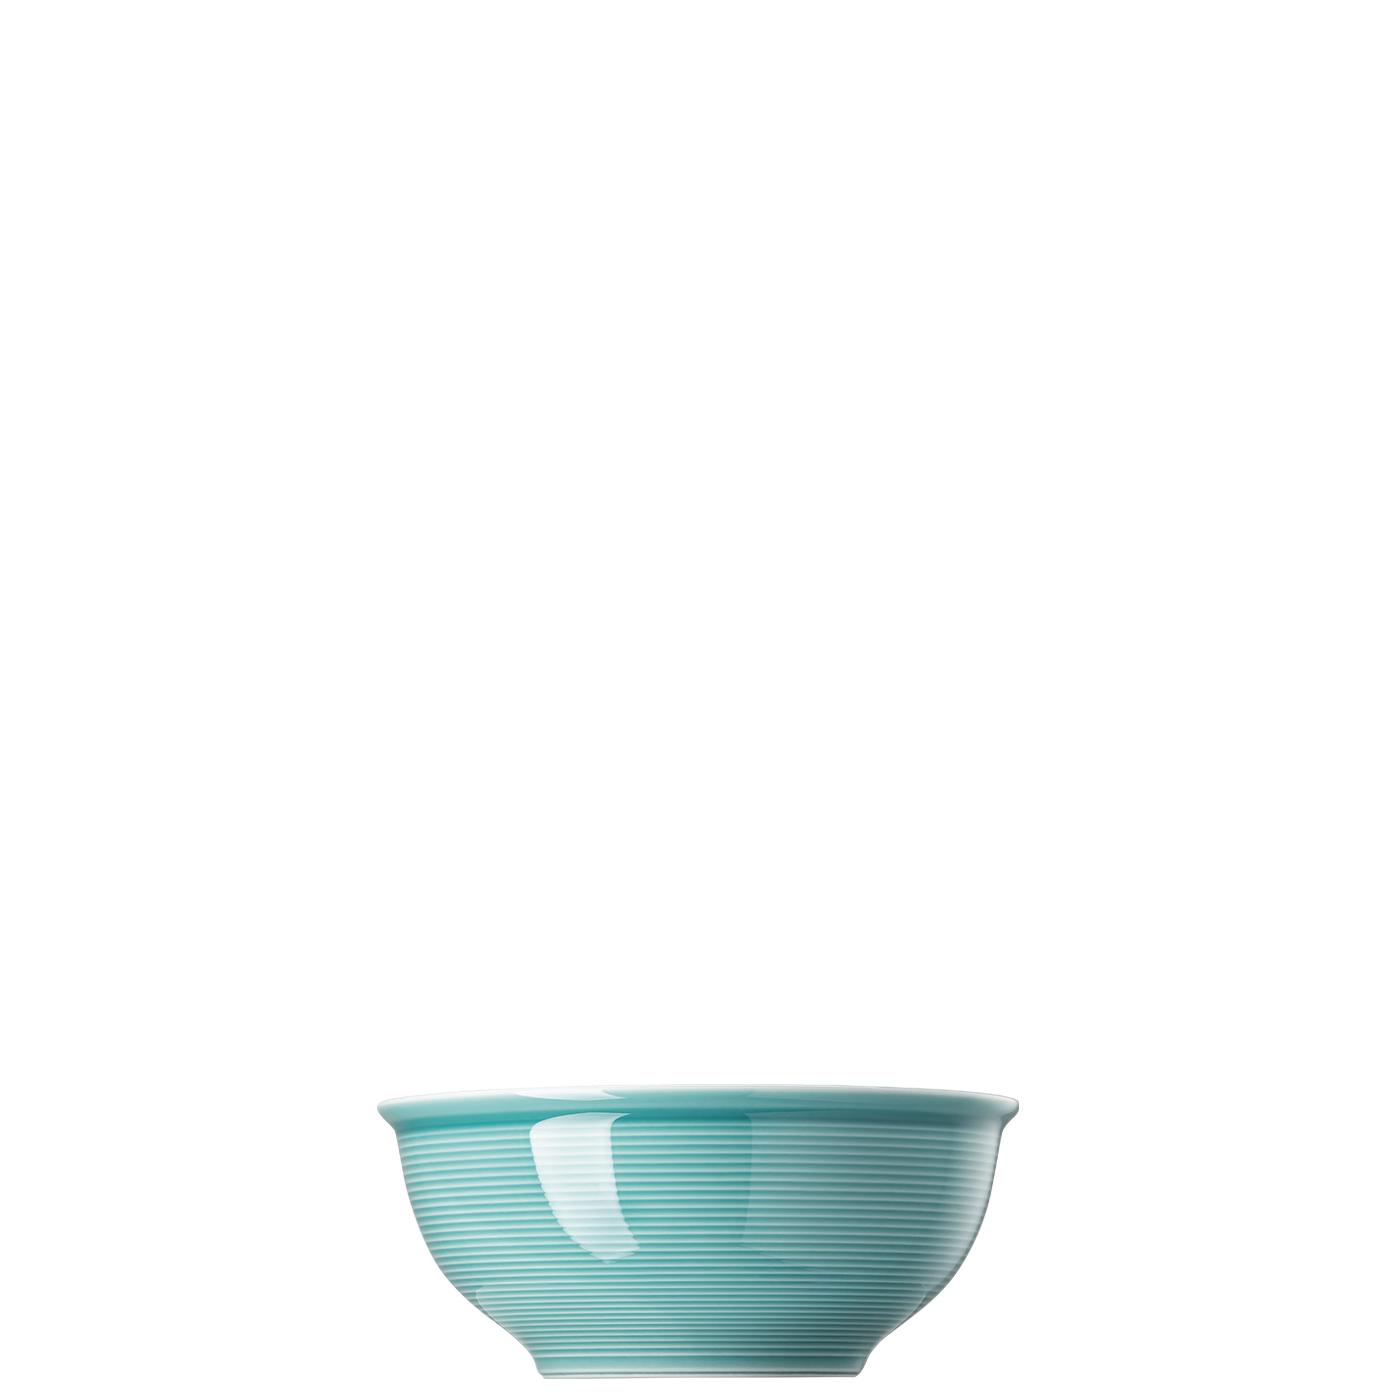 Müslischale 16 cm Trend Colour Ice Blue Thomas Porzellan